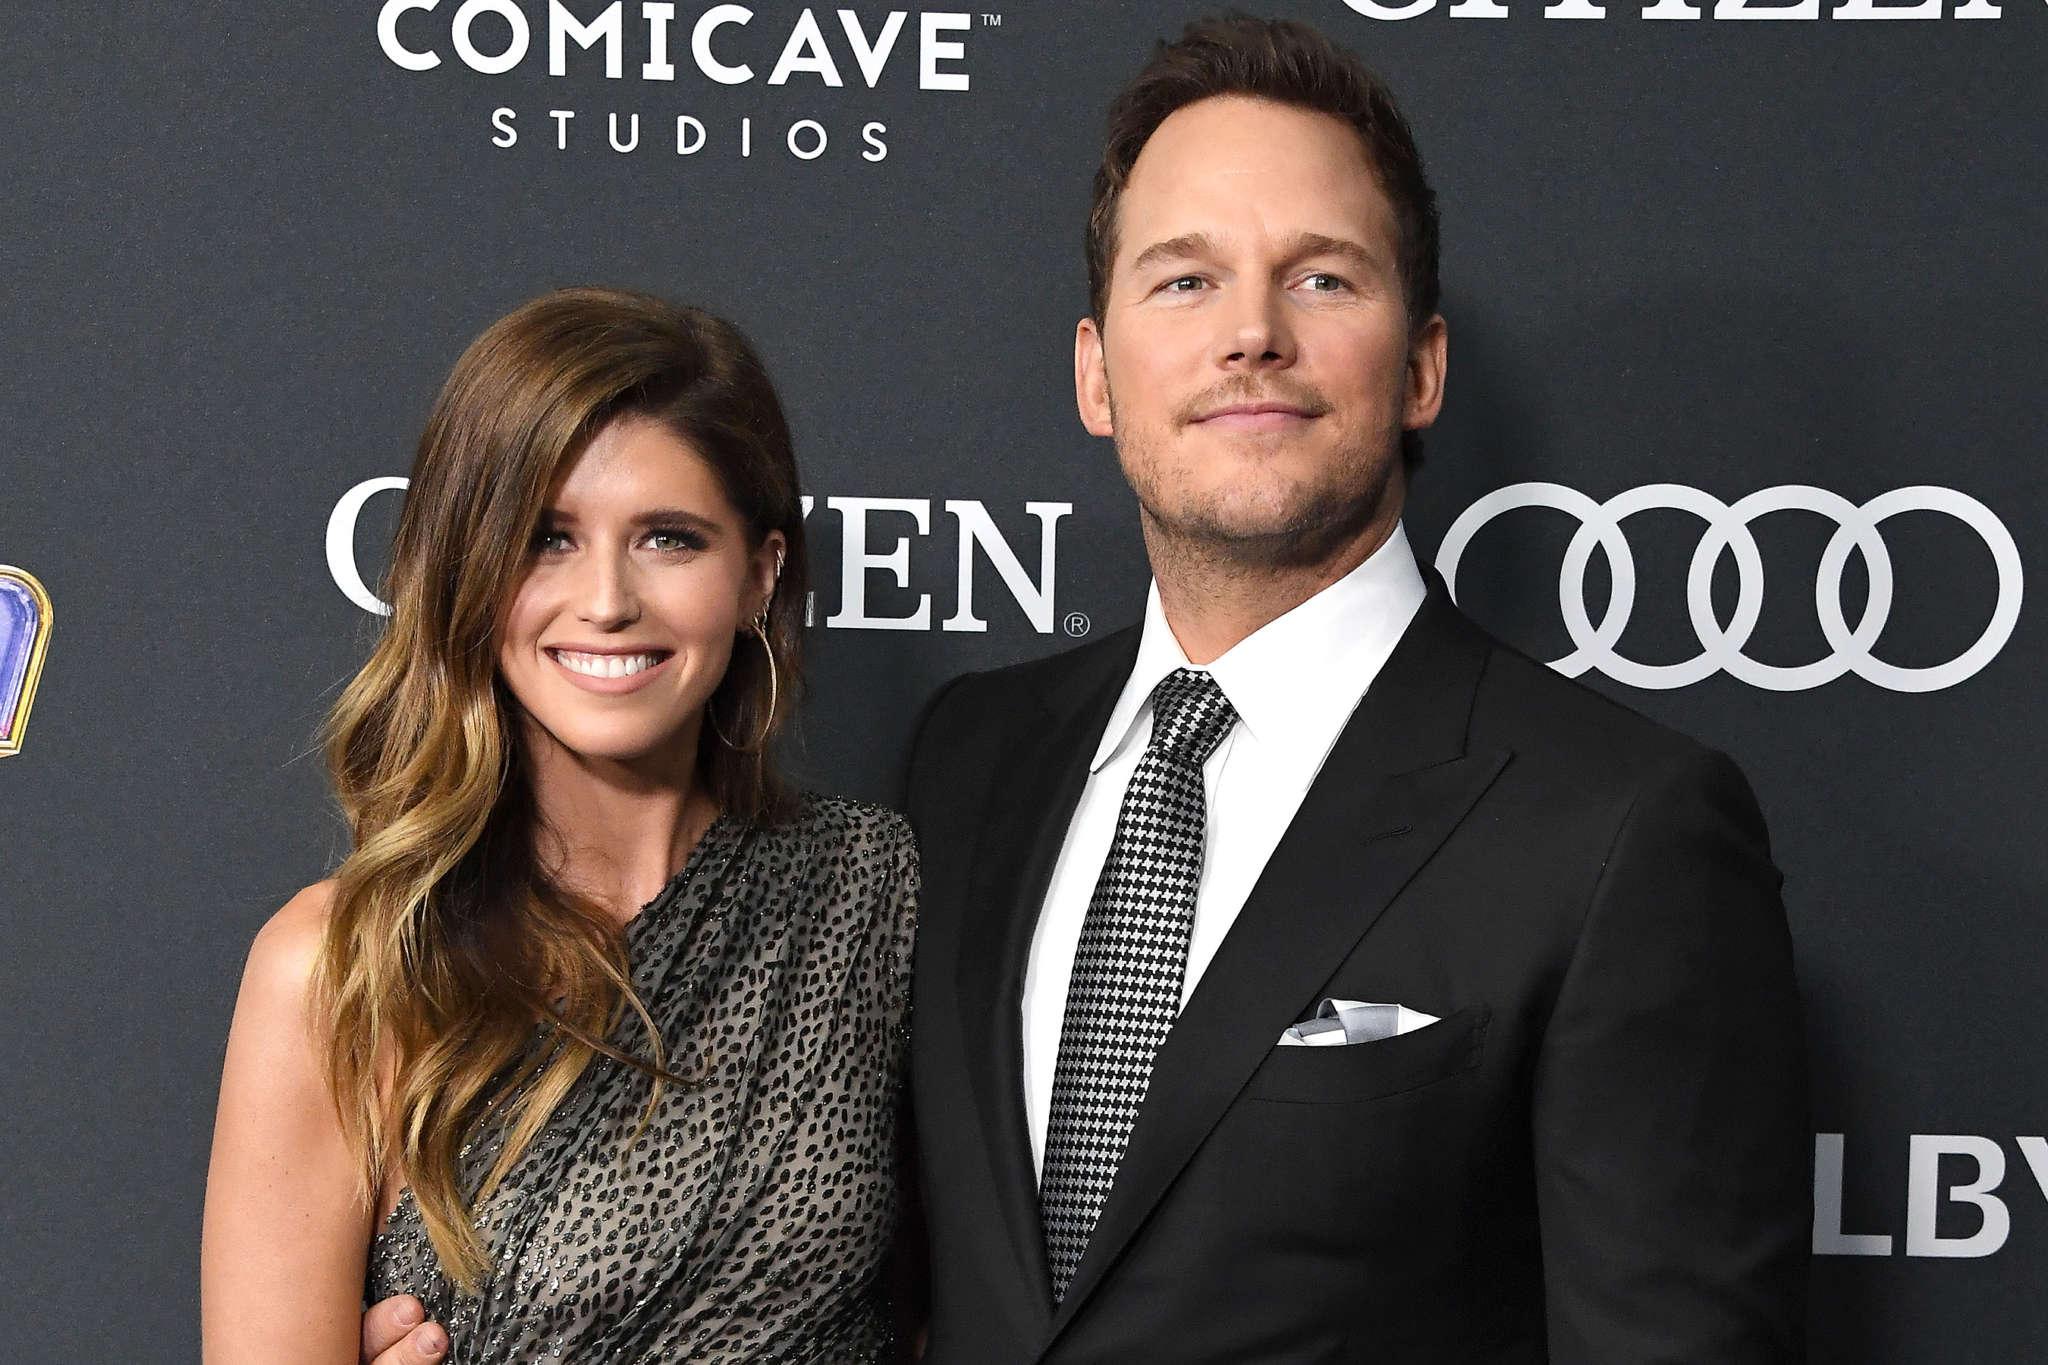 Chris Pratt Slammed For Being 'Sexist' After Making Fun Of Wife Katherine Schwarzenegger's Cooking